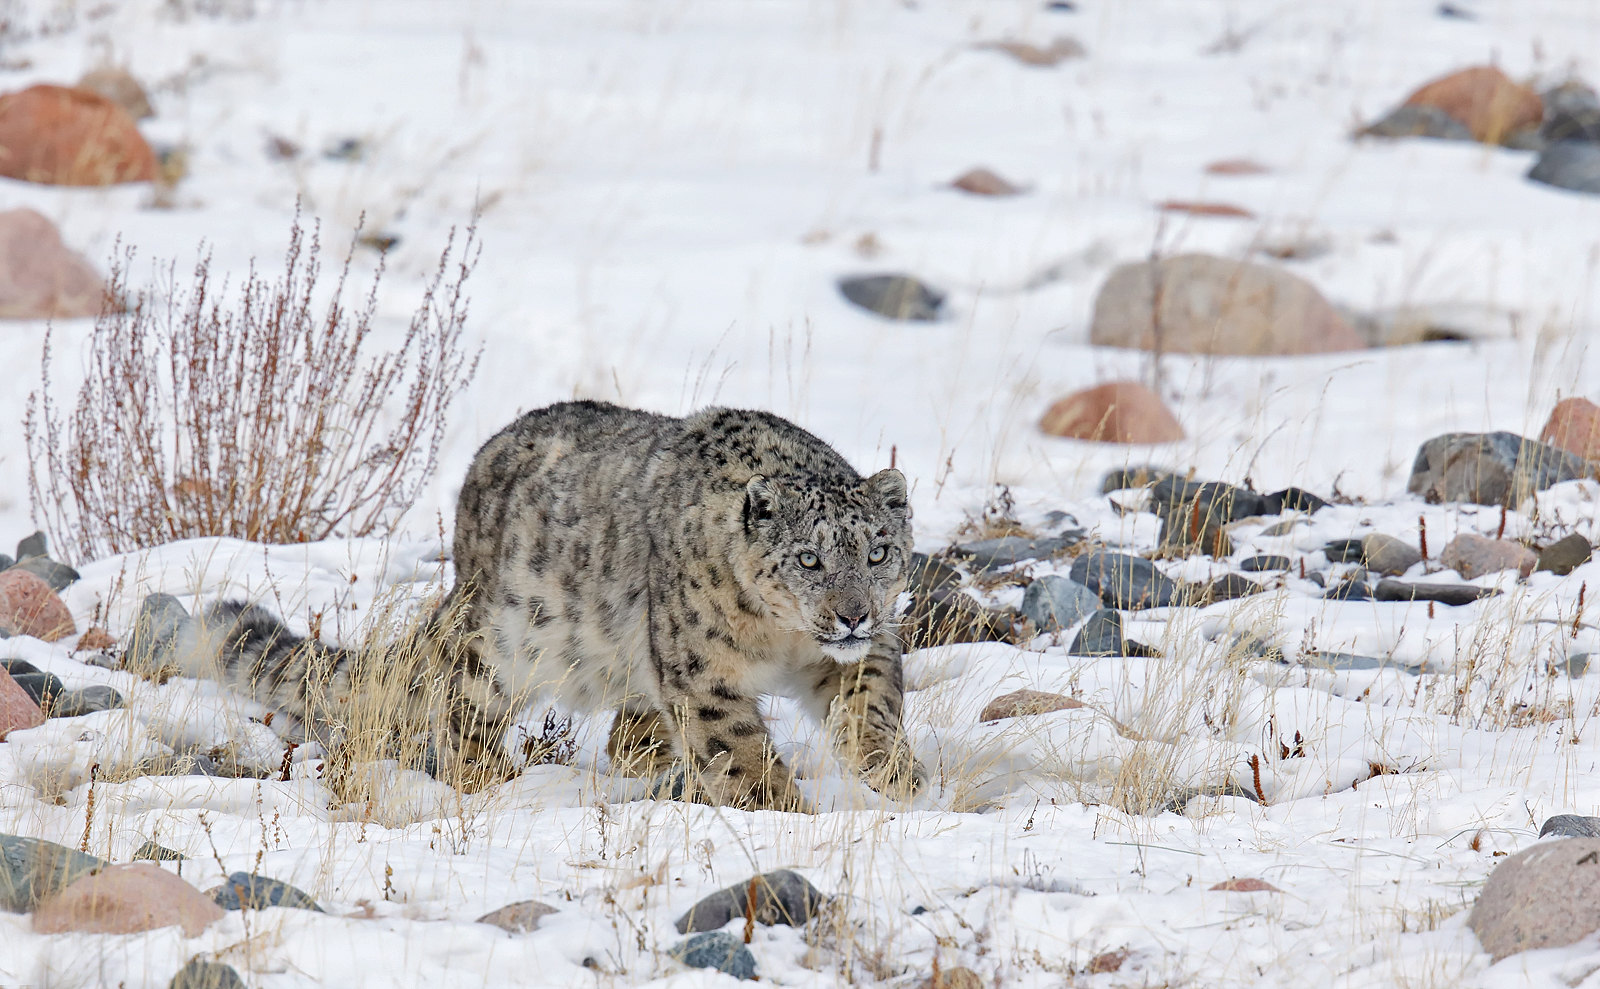 Snow Leopard / Panthera uncia - male